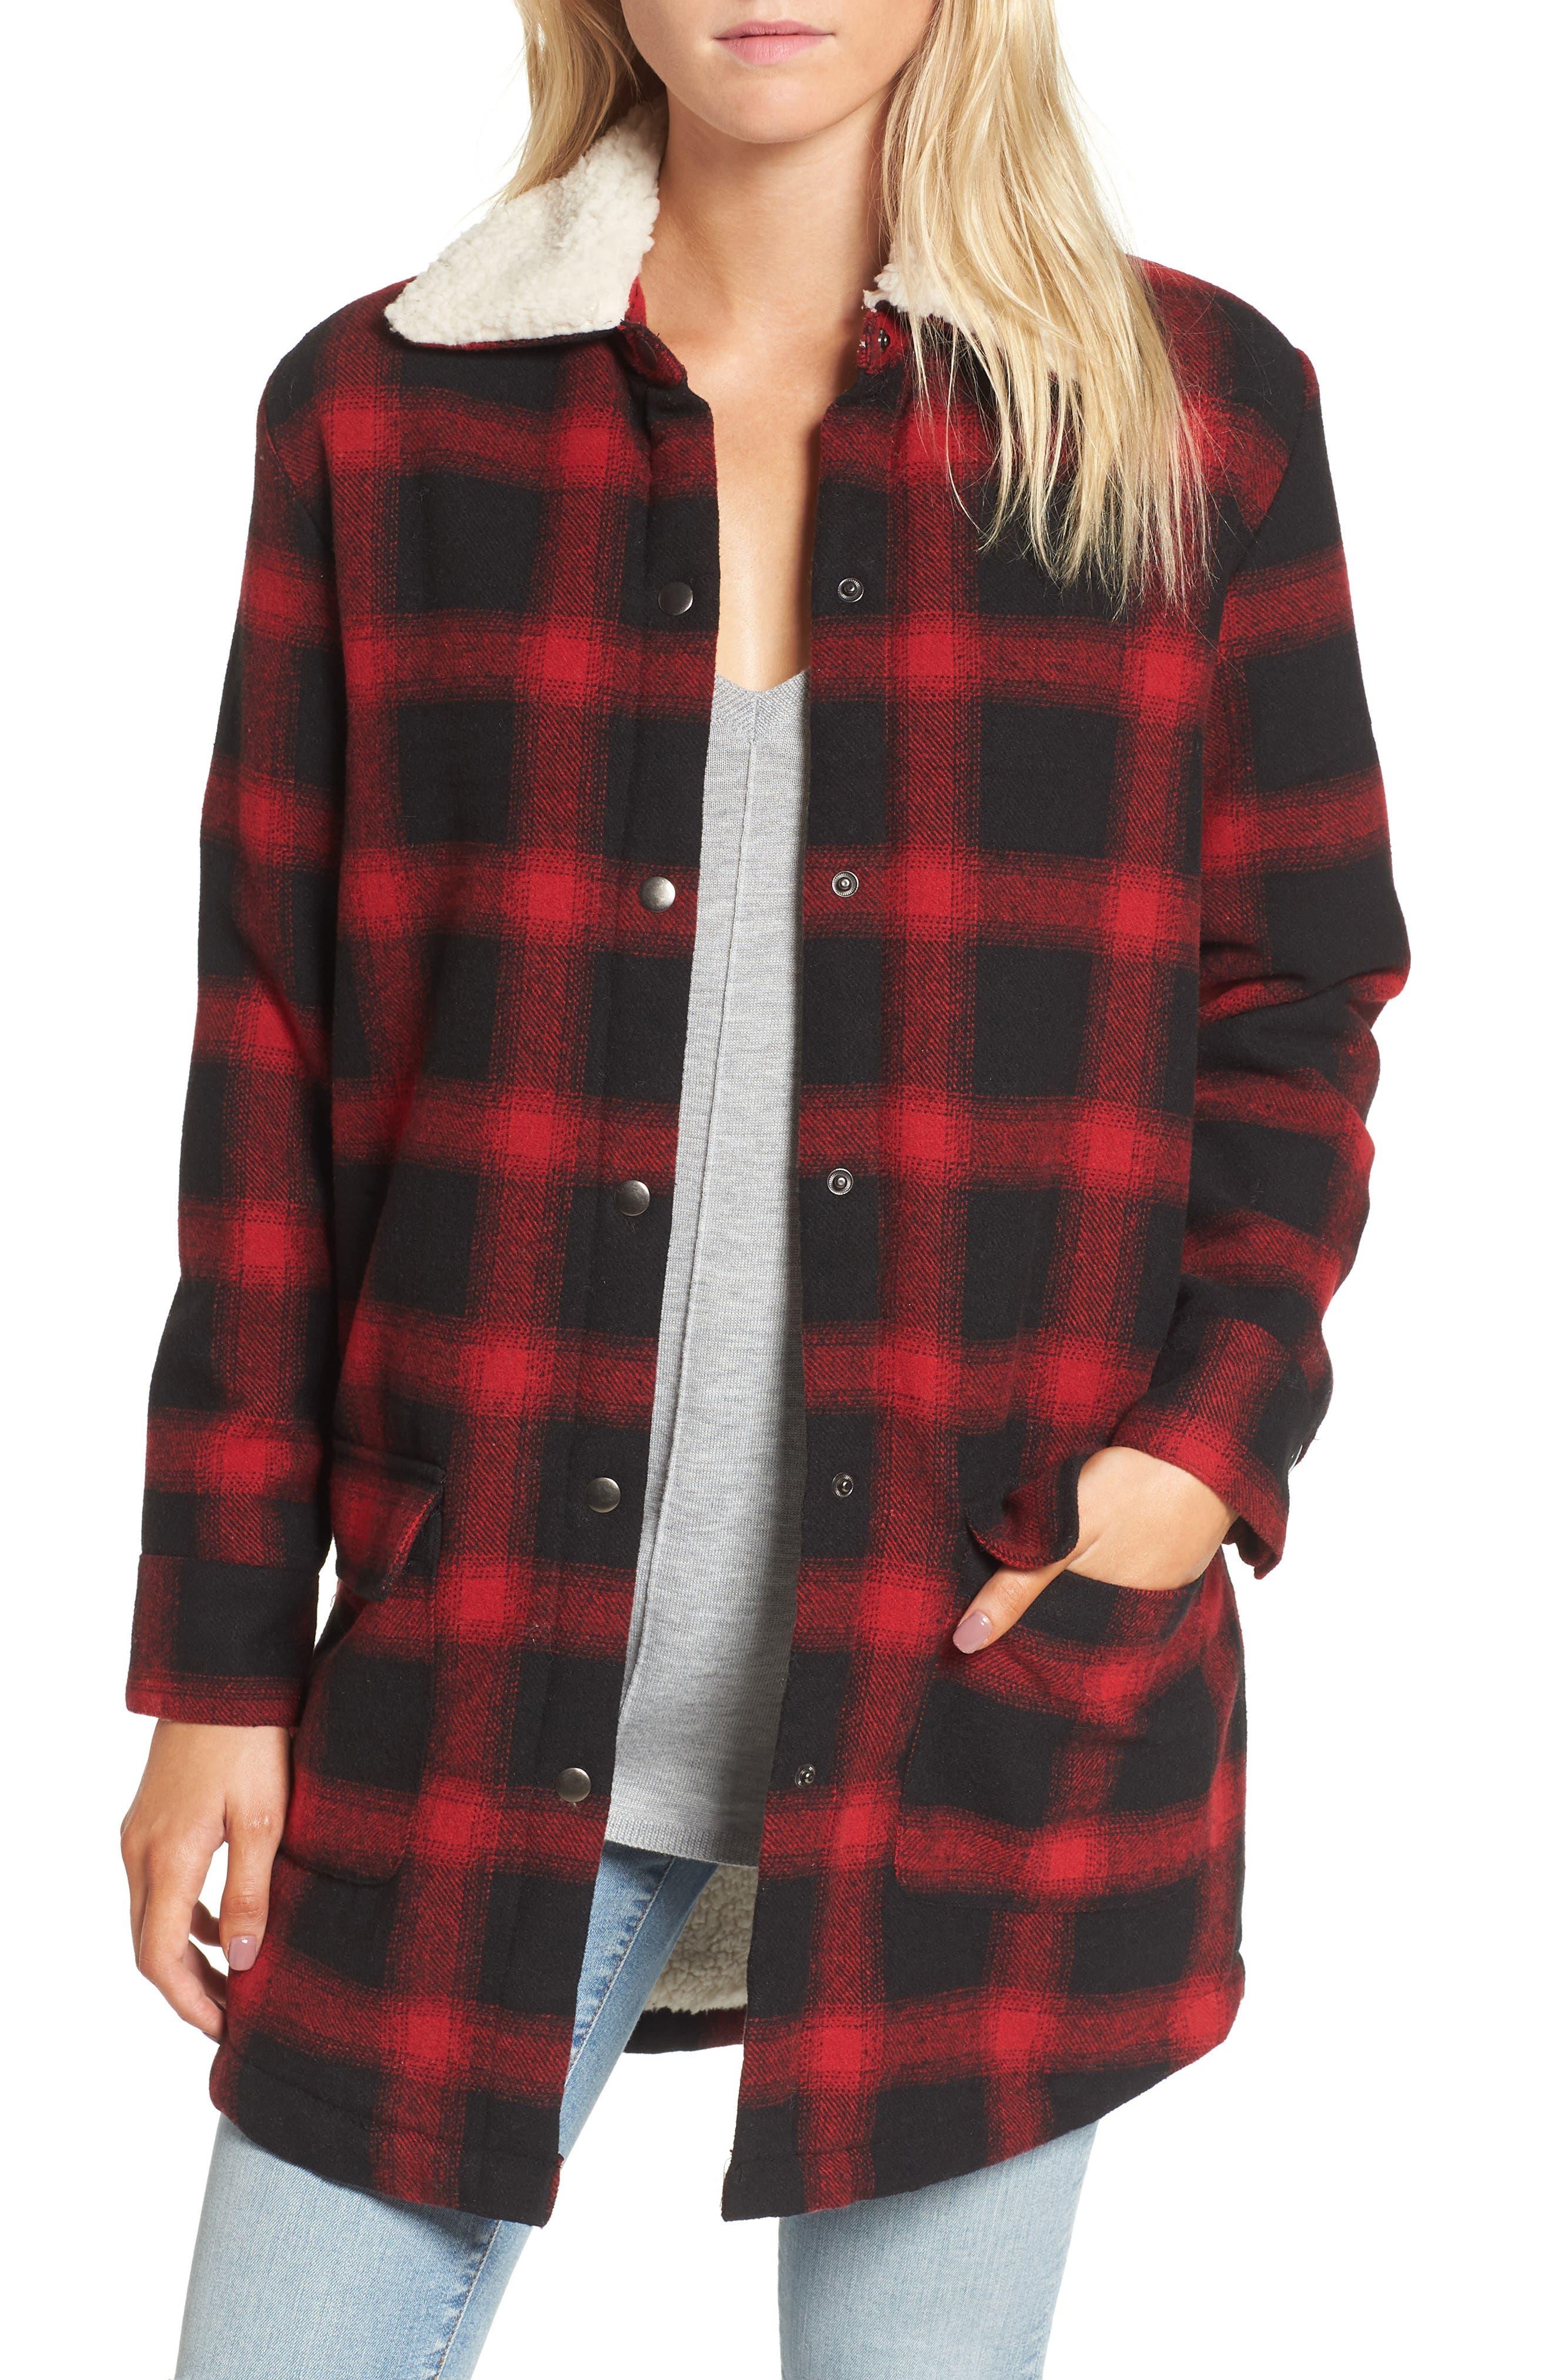 Bradley Fleece Lined Plaid Coat,                         Main,                         color, Cherry Red